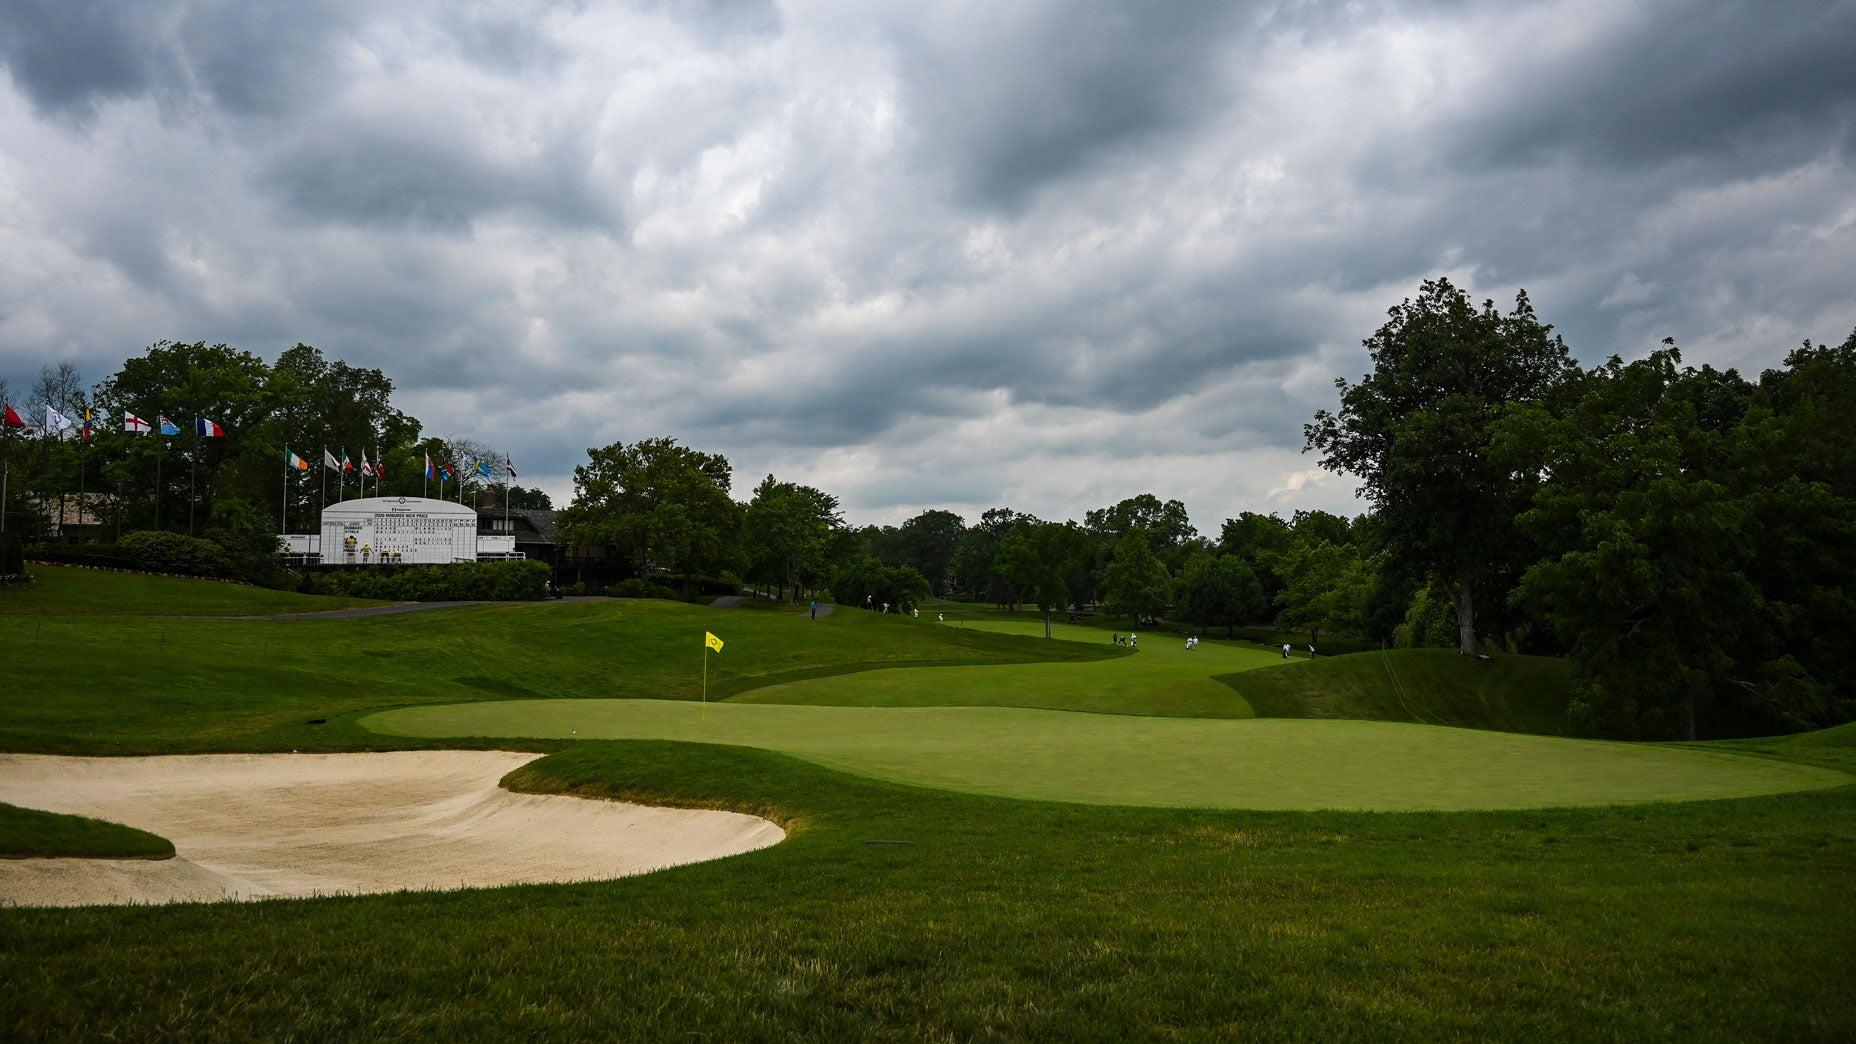 The par-4 18th hole at Muirfield Village Golf Club in 2020.